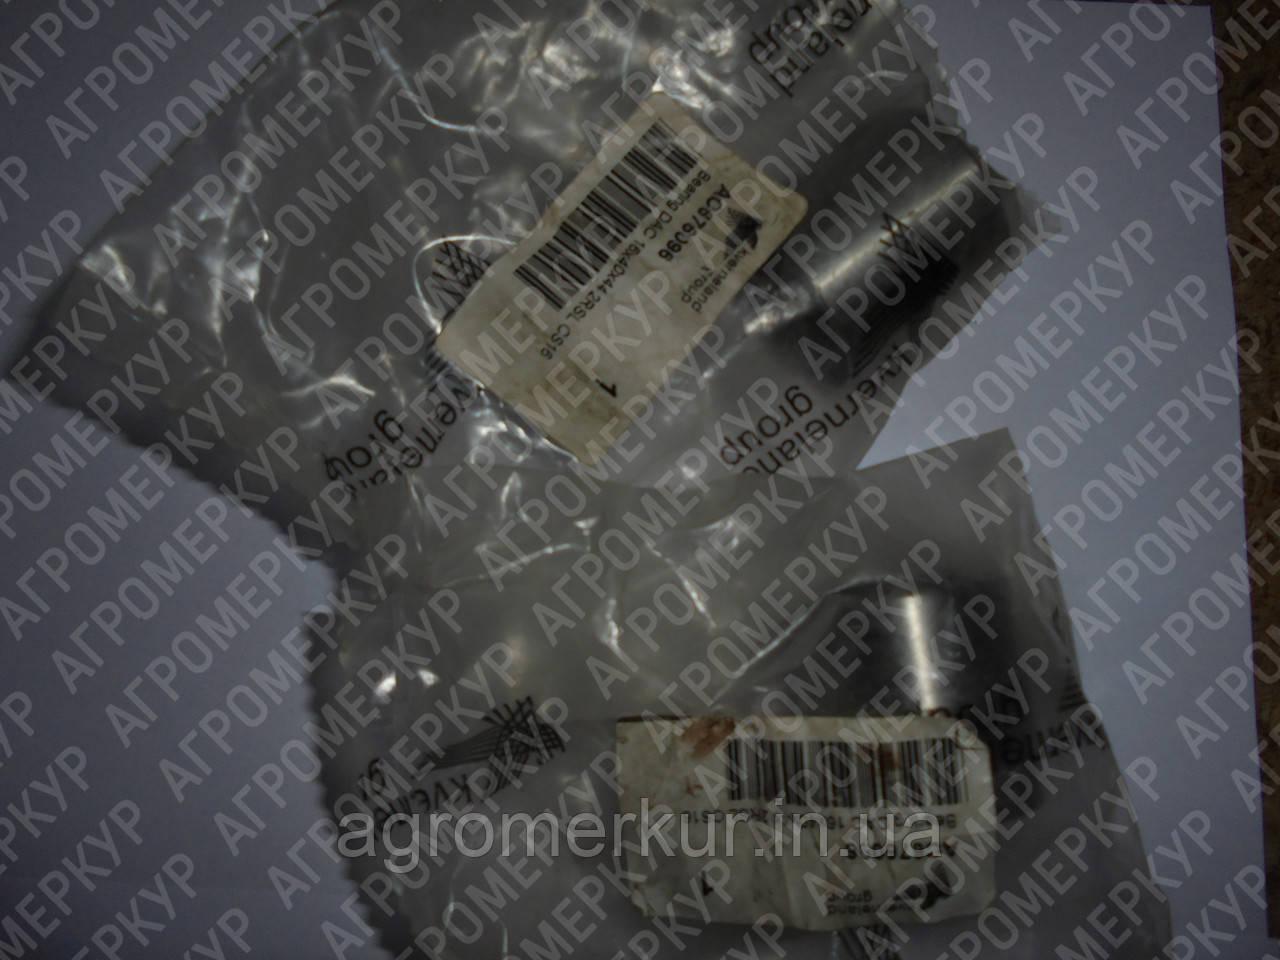 Підшипник AC676096 Kverneland